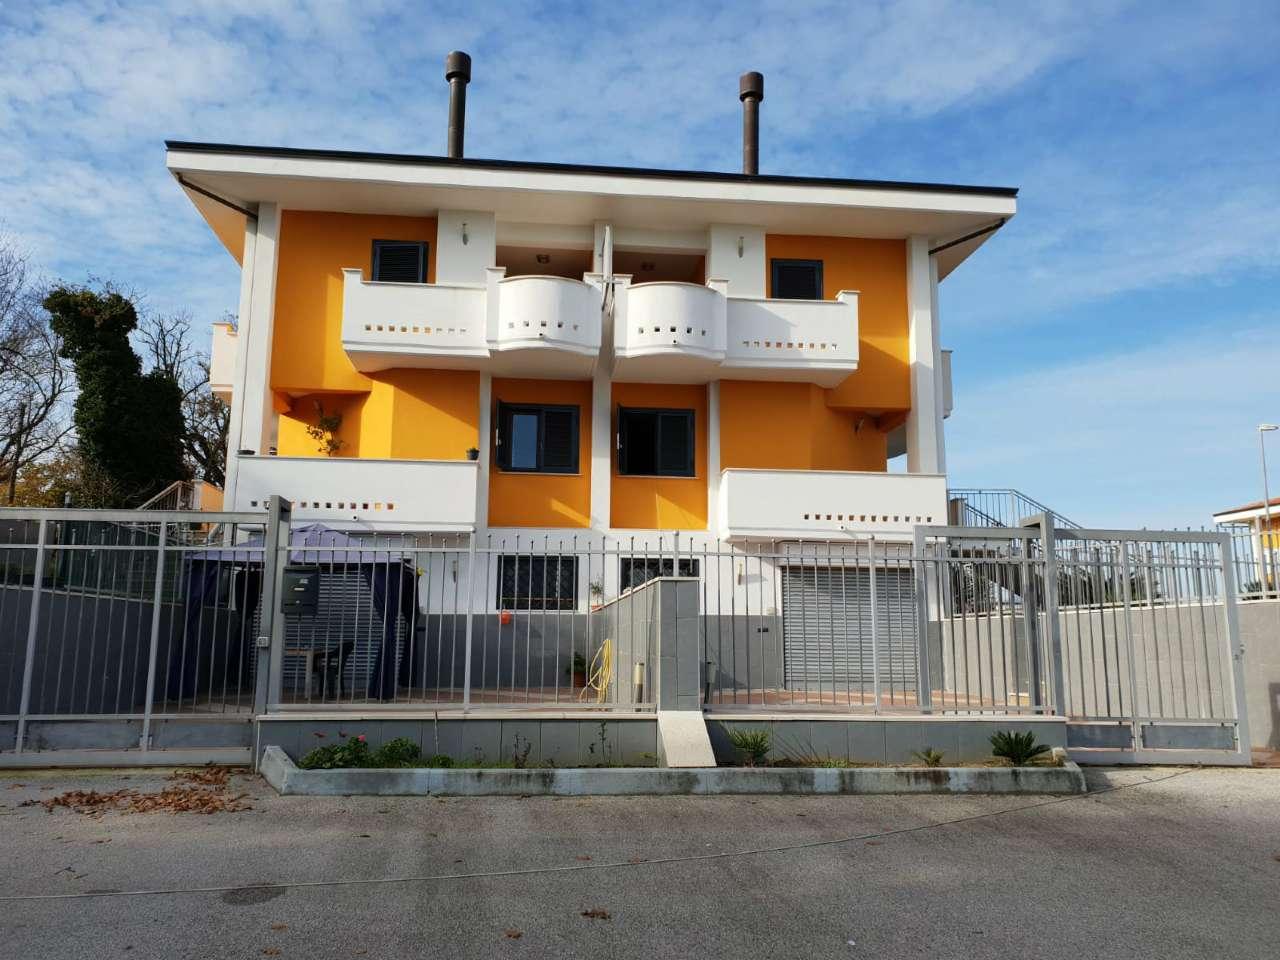 Foto 1 di Villa contrada Montecalvo, Benevento